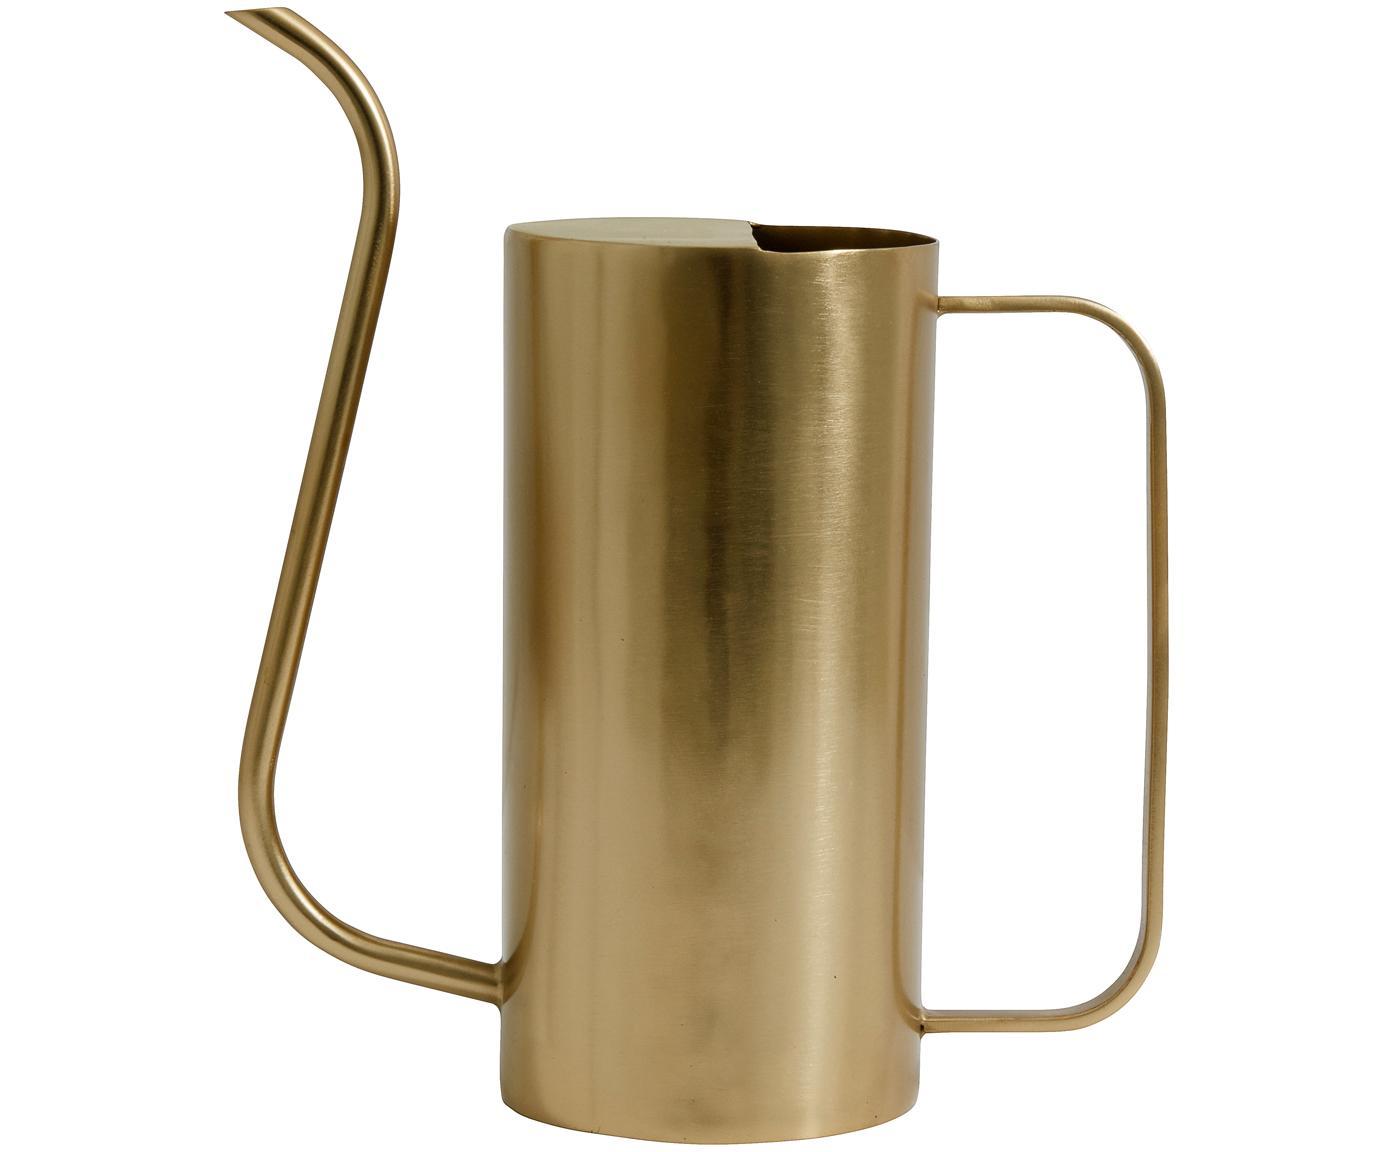 Giesskanne Brass, Eisen, vermessingt, Messing, 25 x 25 cm